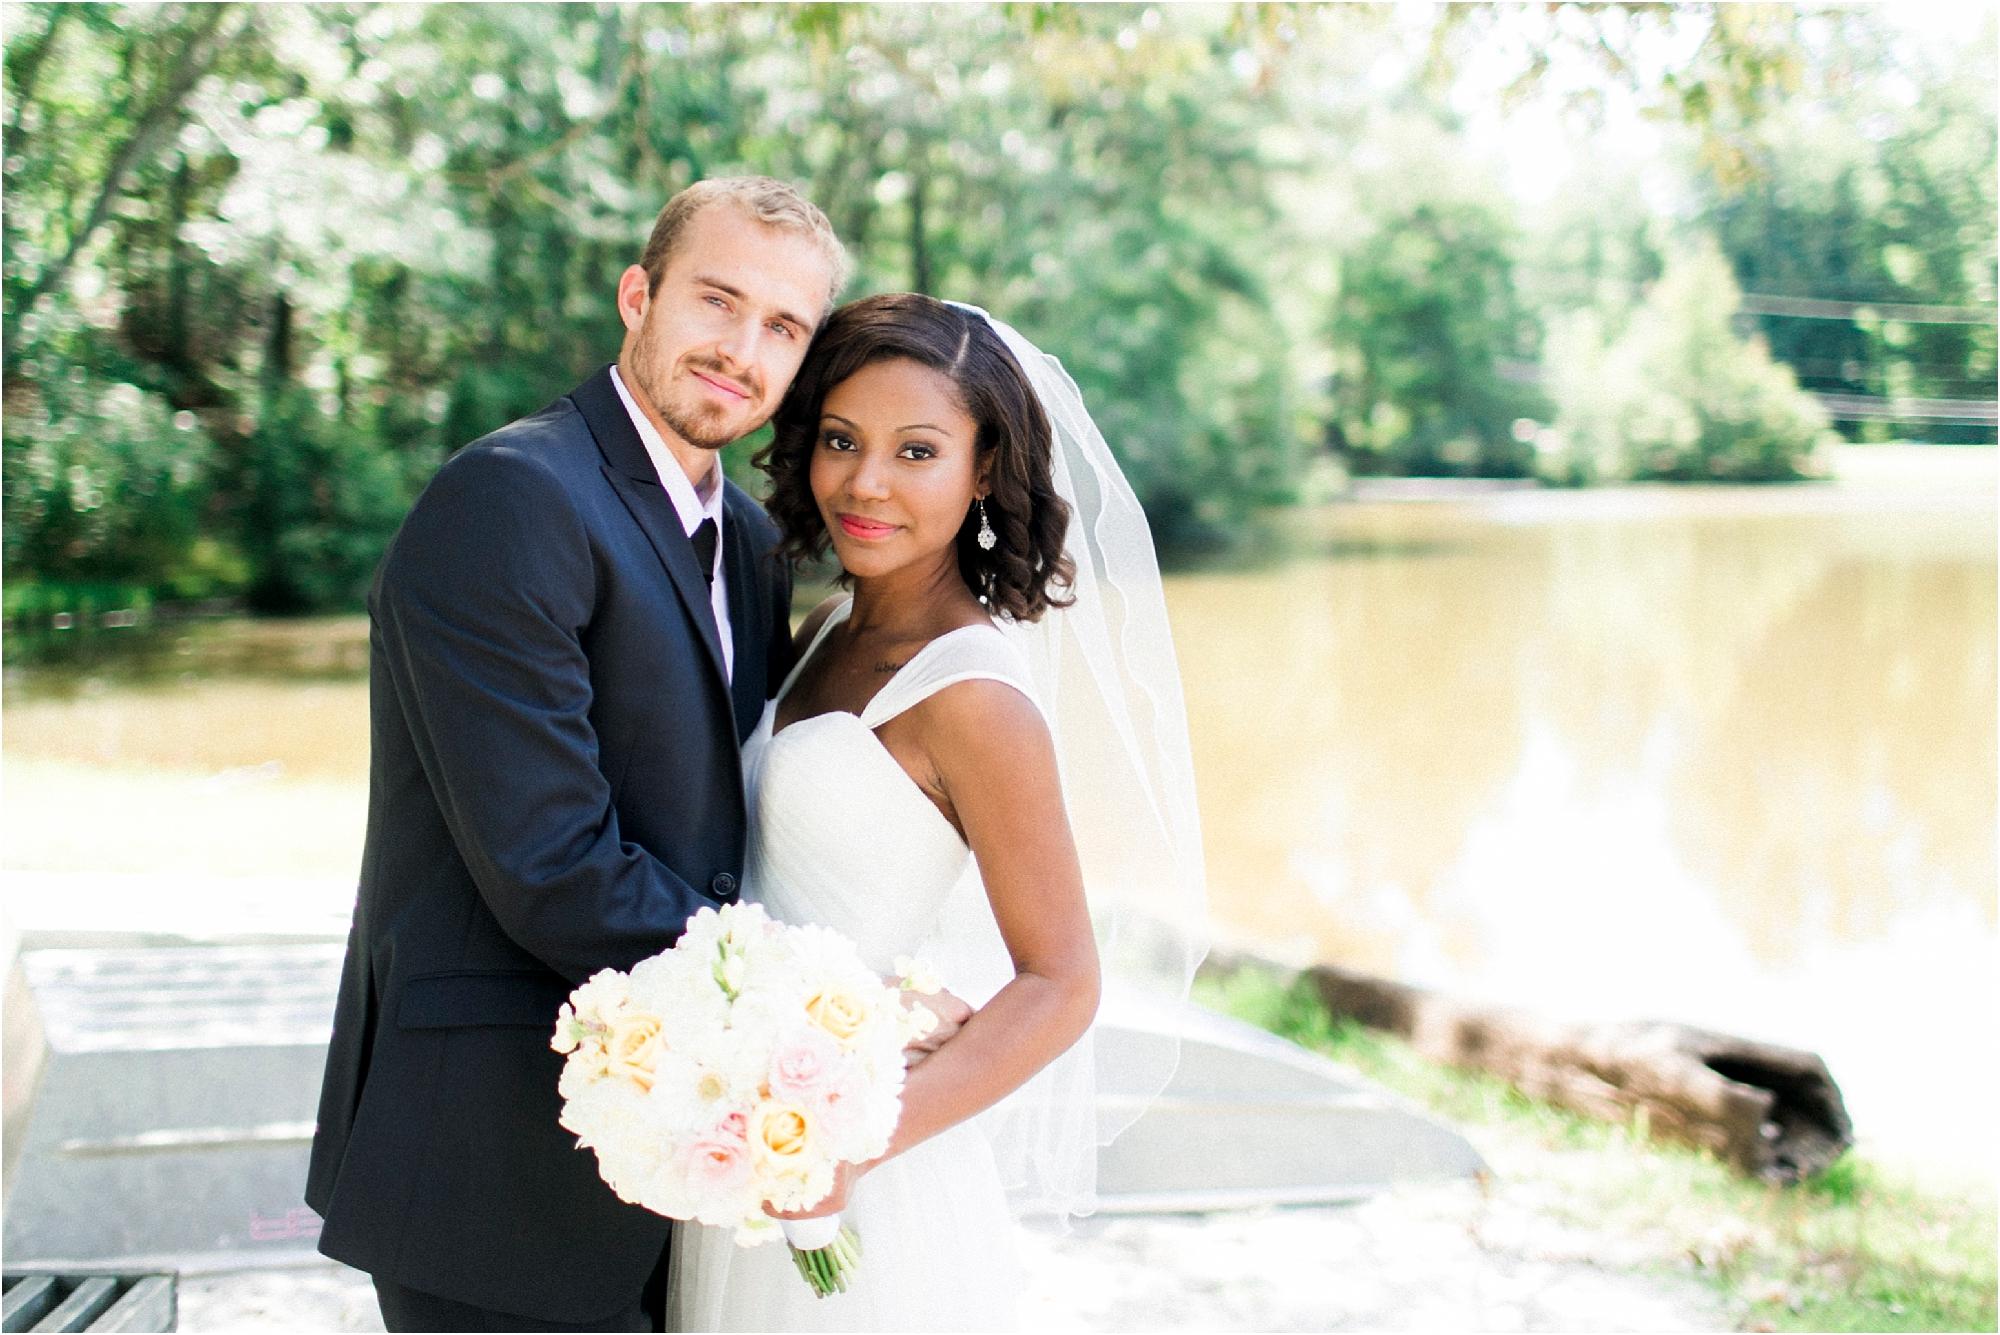 inimate-richmond-virginia-backyard-summer-wedding-photos_0025.jpg